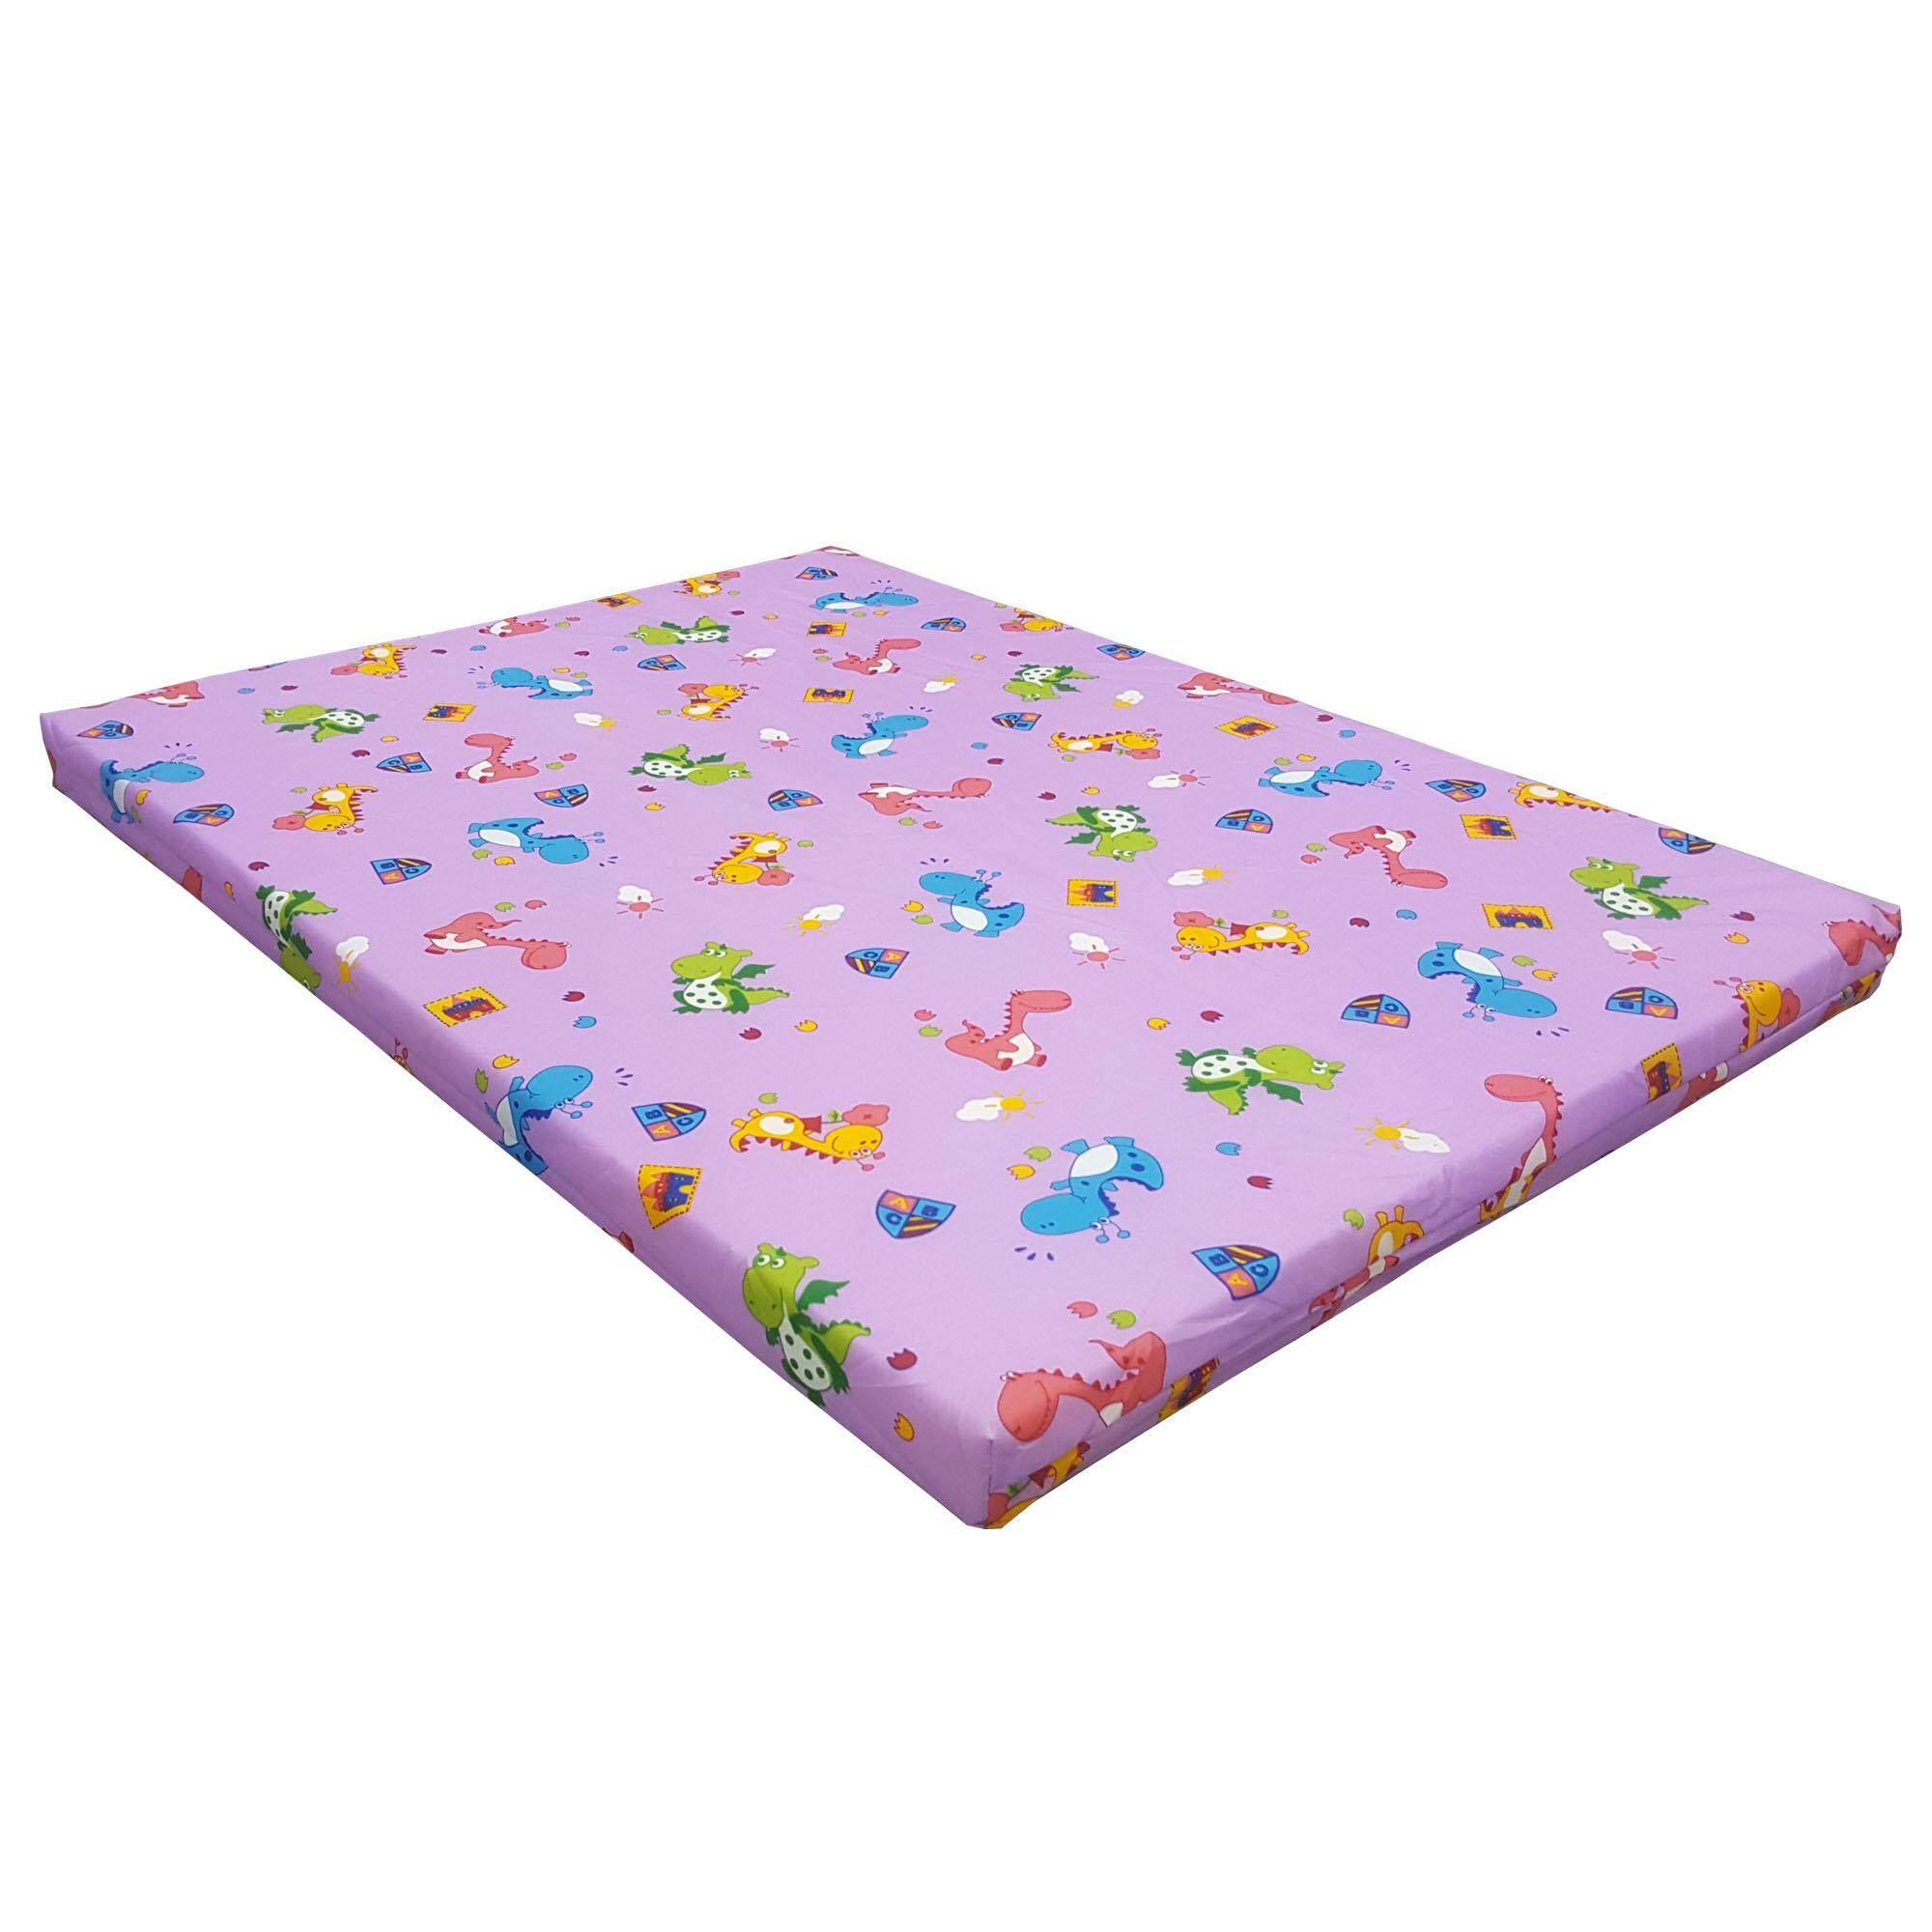 Features Comfy Baby Purotex Playpen Topper Cover 71 X 104 3cm Dan Memory Foam Bolster Mattress 71cm 101cm Pg Dp